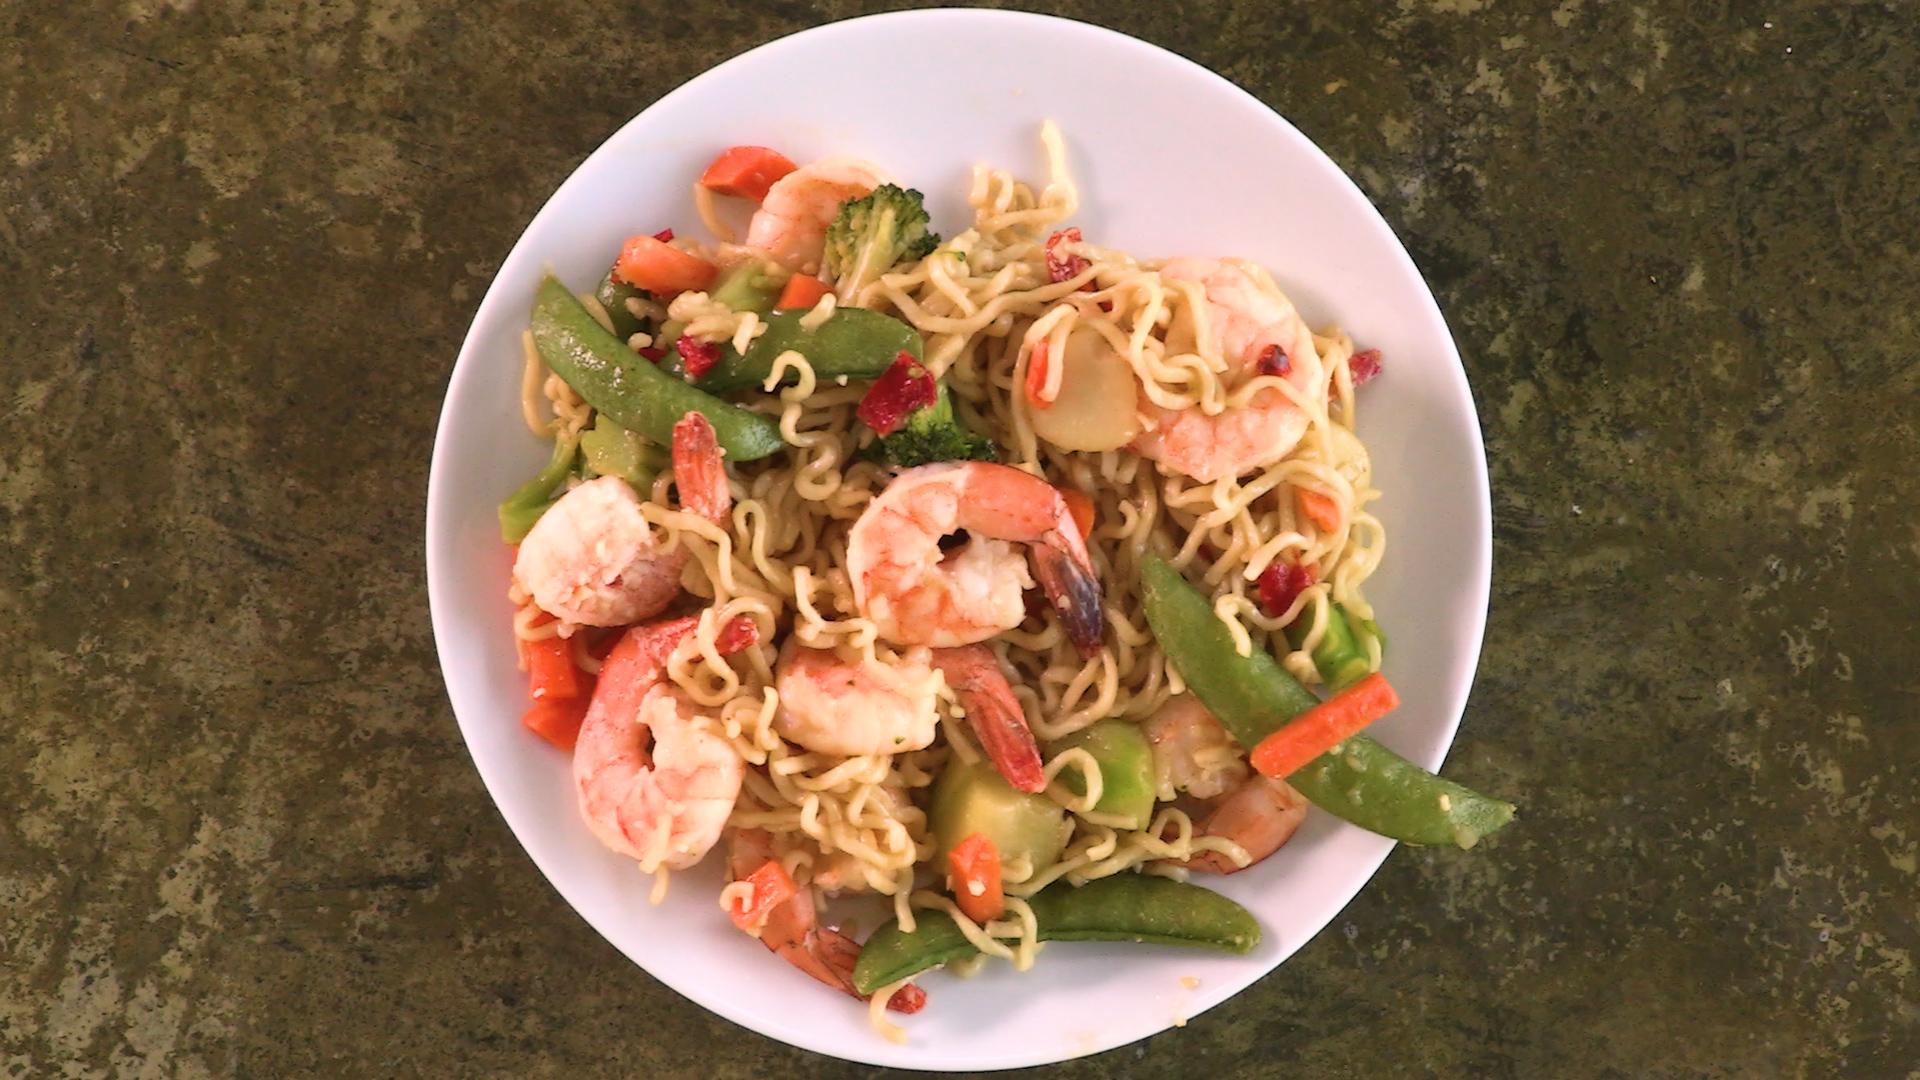 shrimp stir fry ramen image